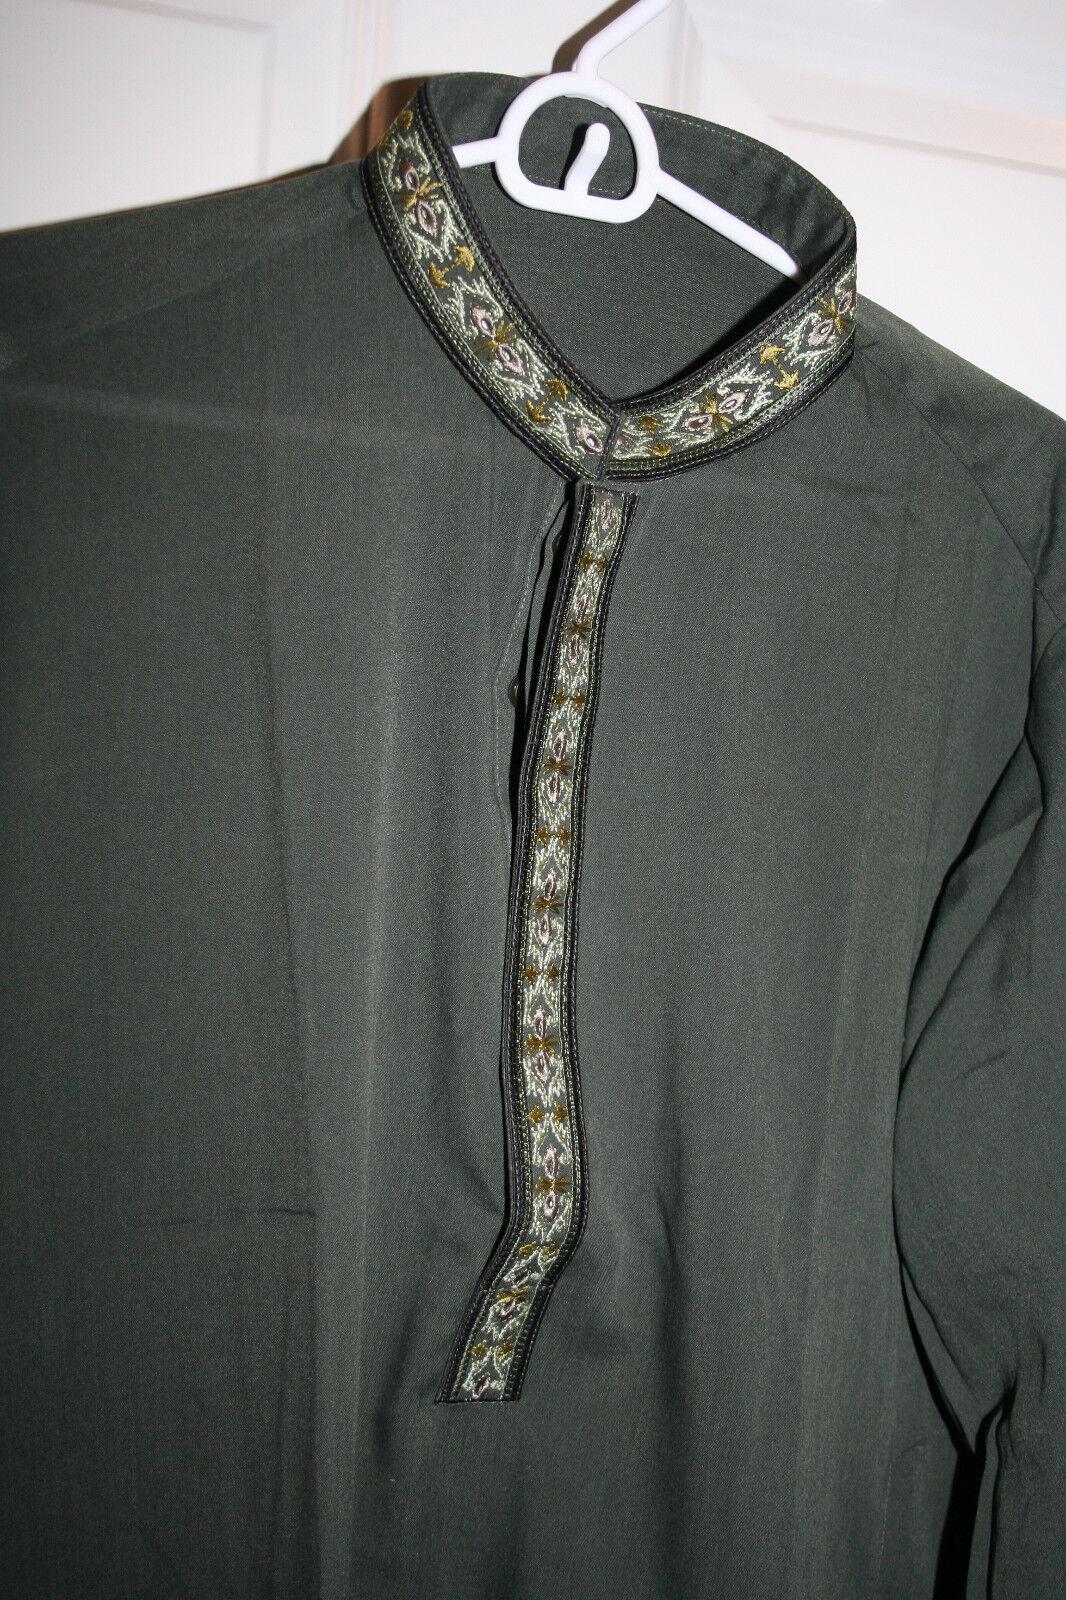 Pakistani Men Salwar Kameez Parties Casual Wear w embroidery Dark Green  M